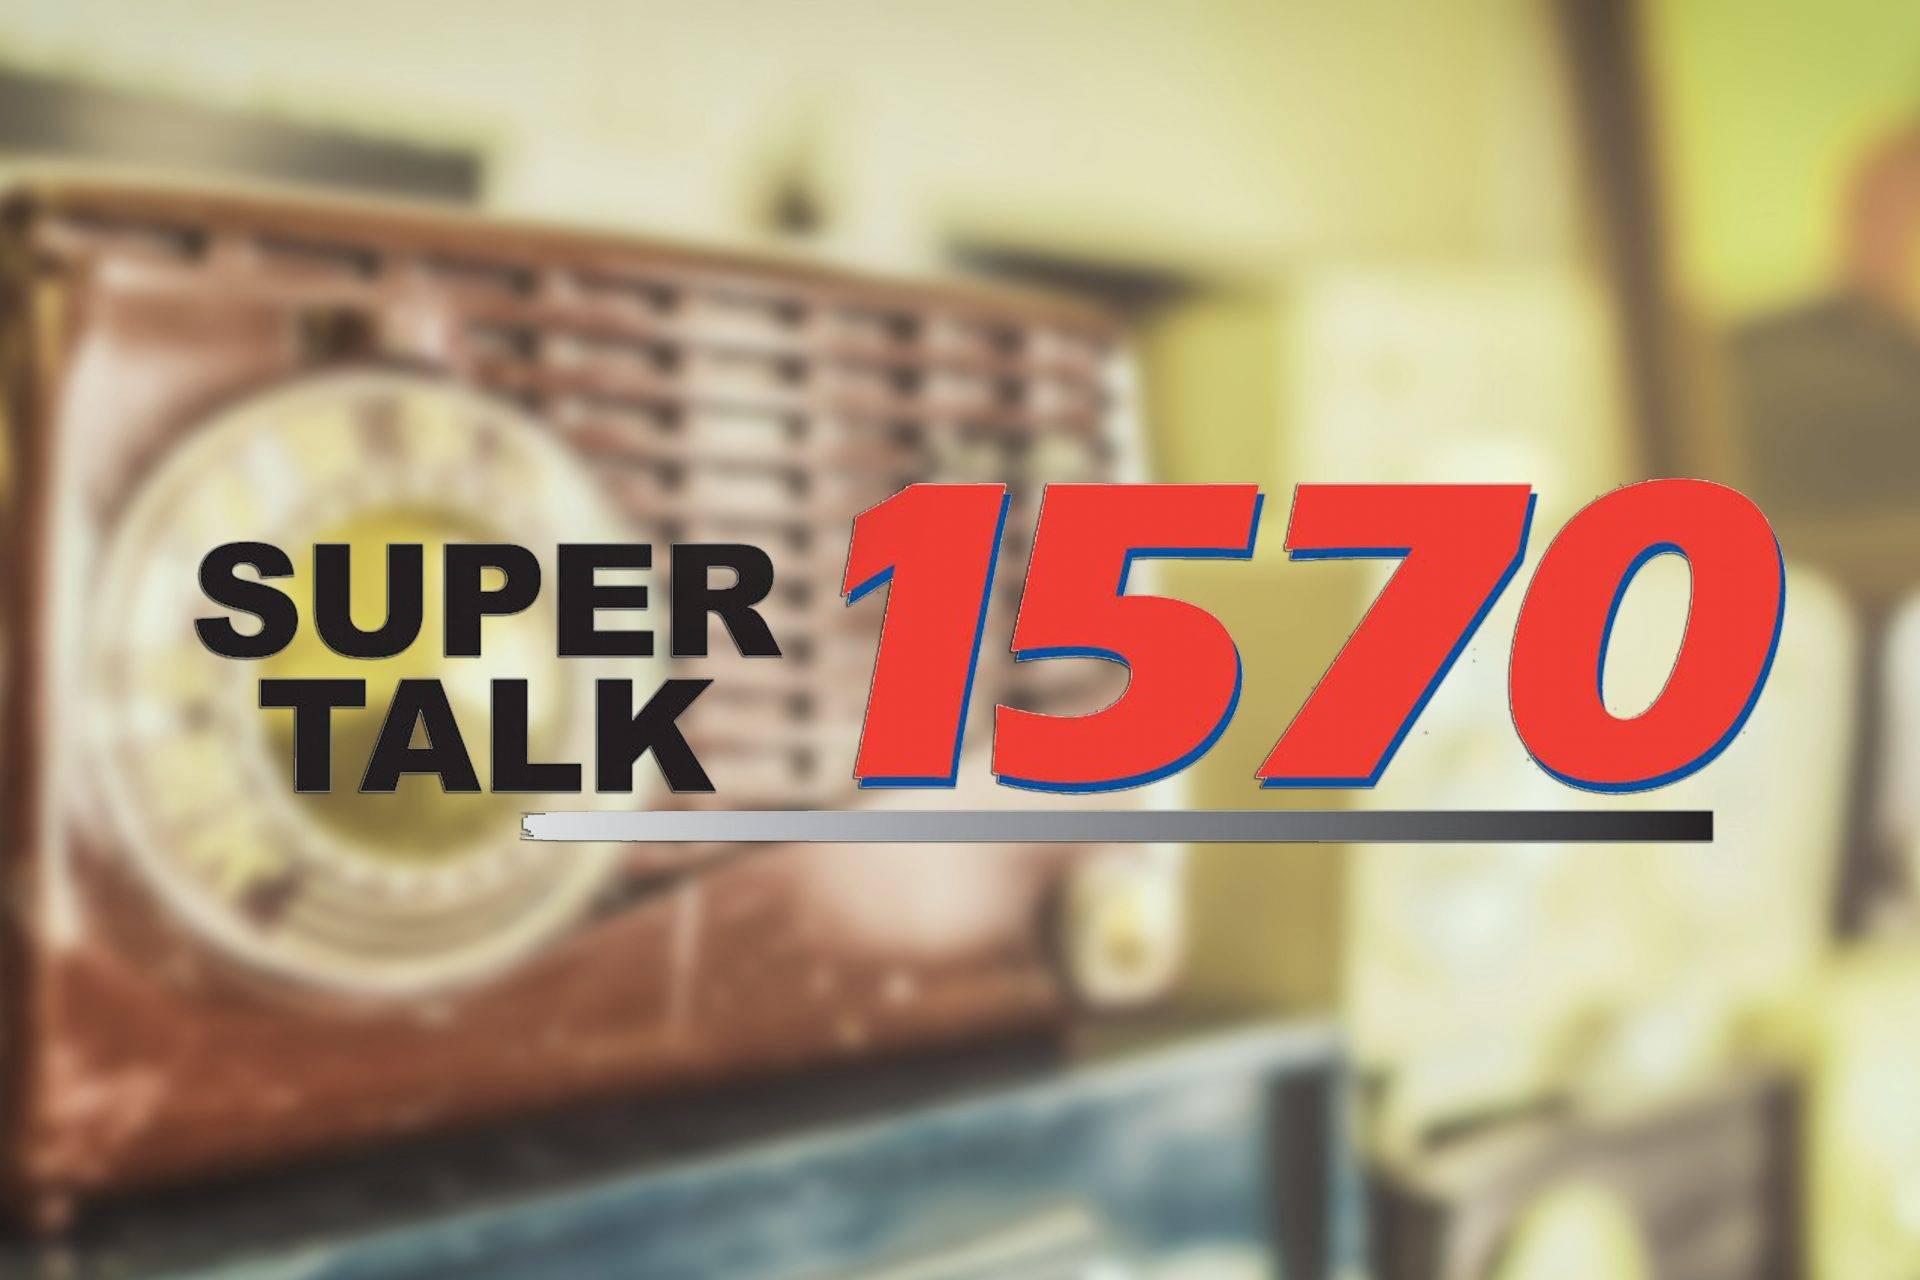 SuperTlak 1570 WWCK